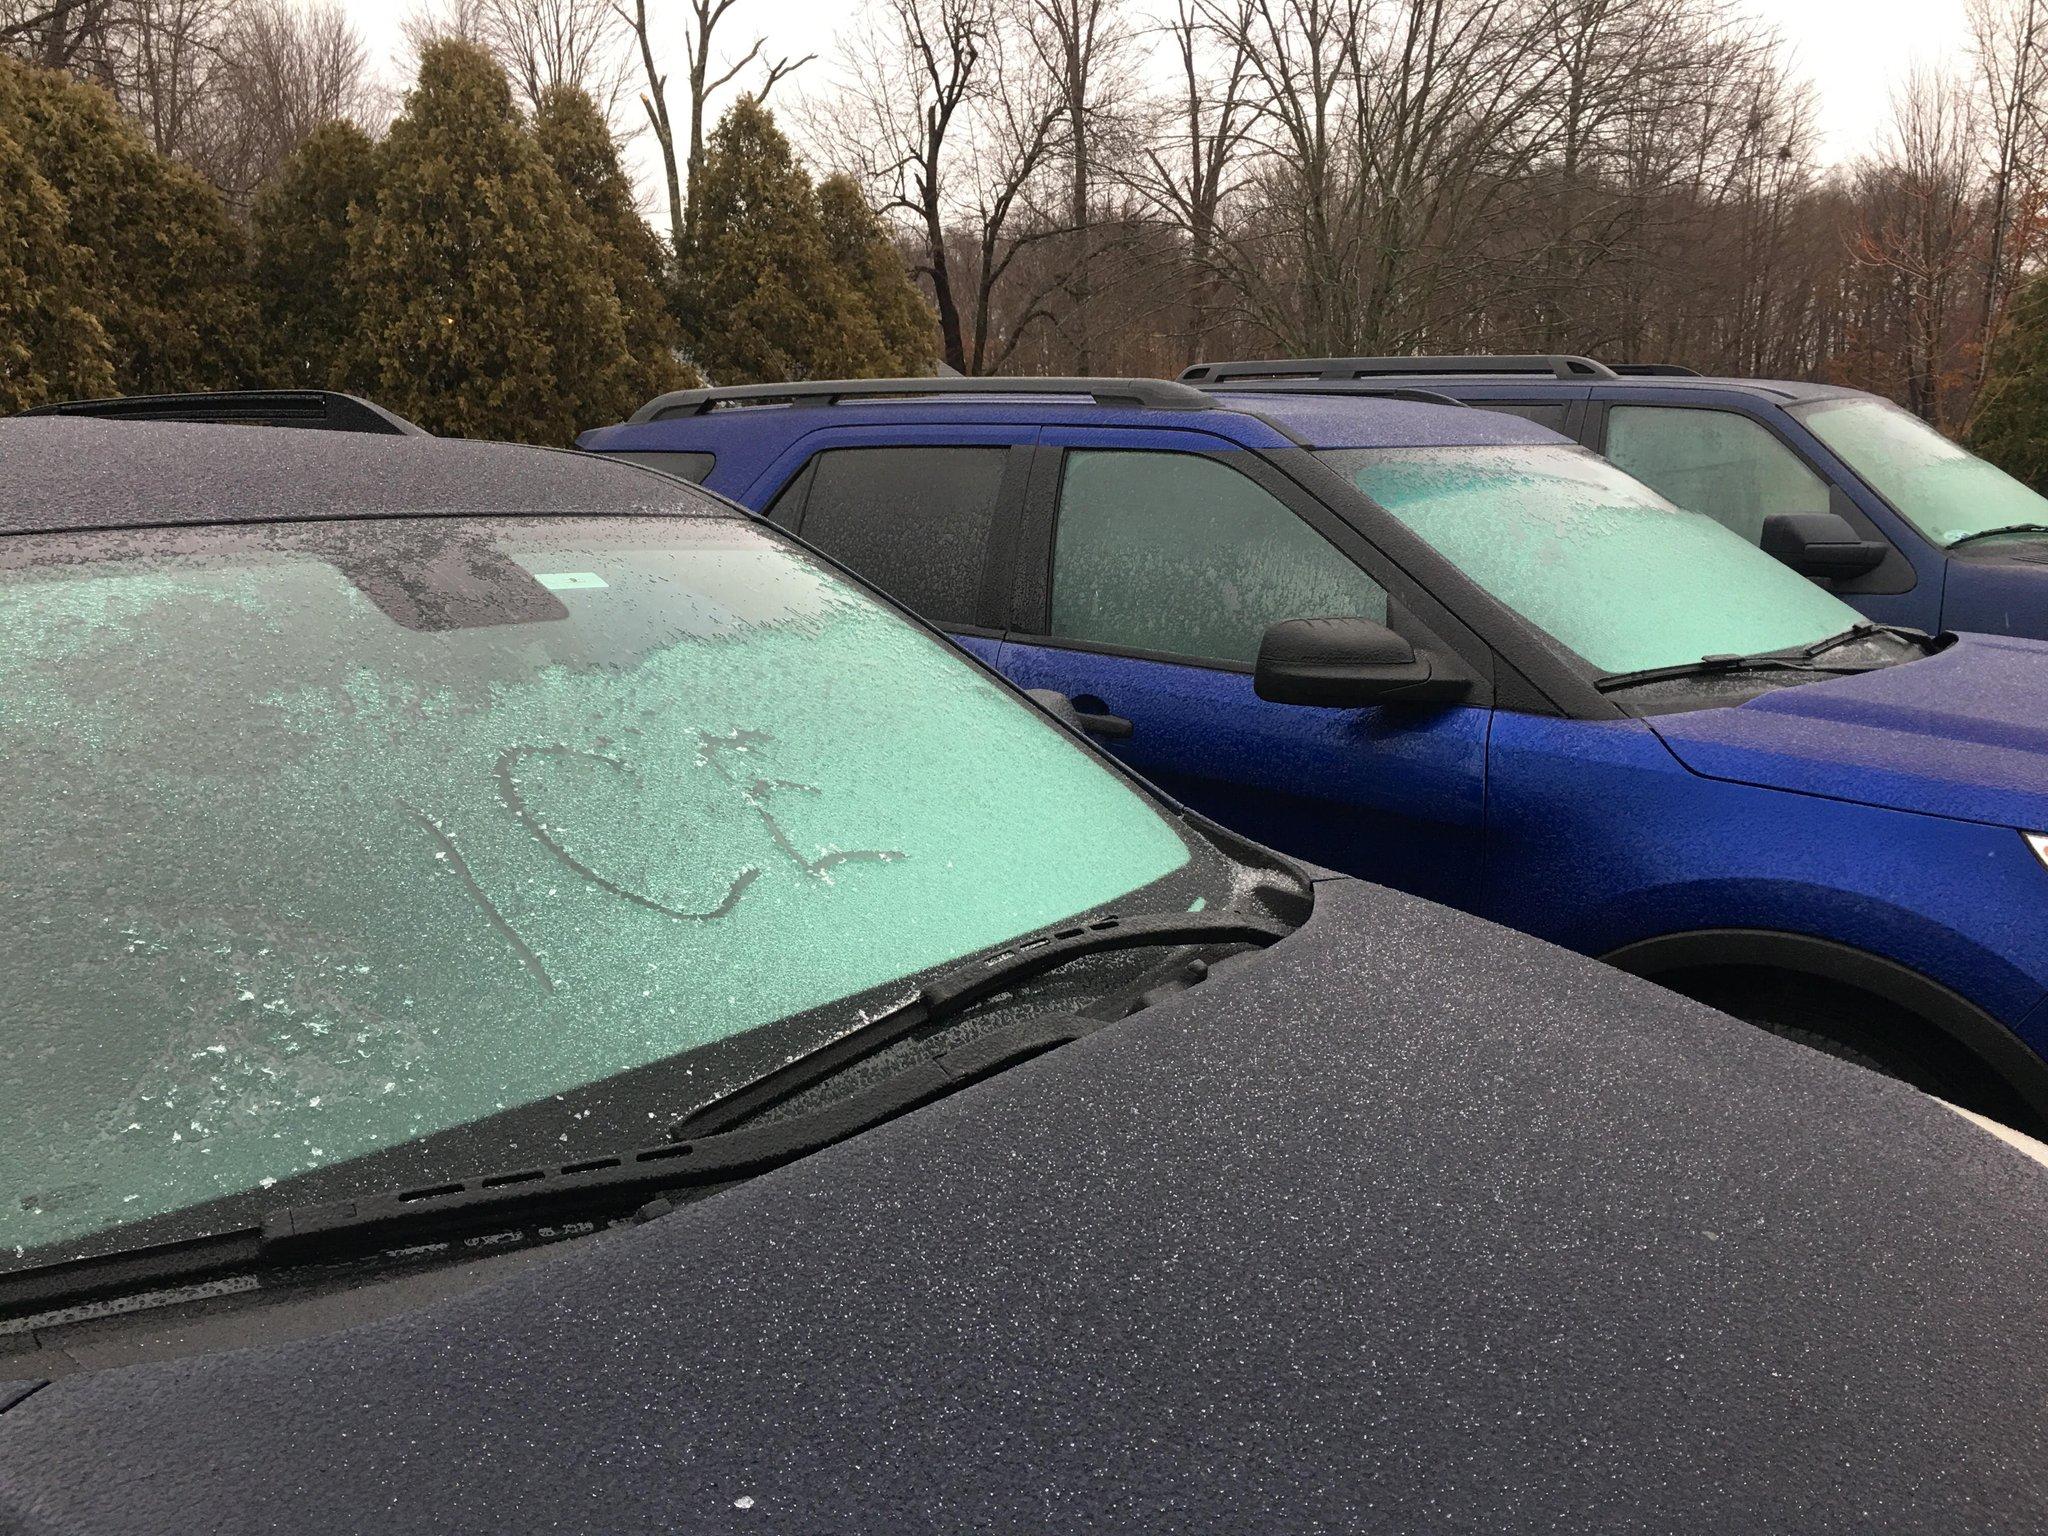 Summary of January 12, 2018 Winter Storm